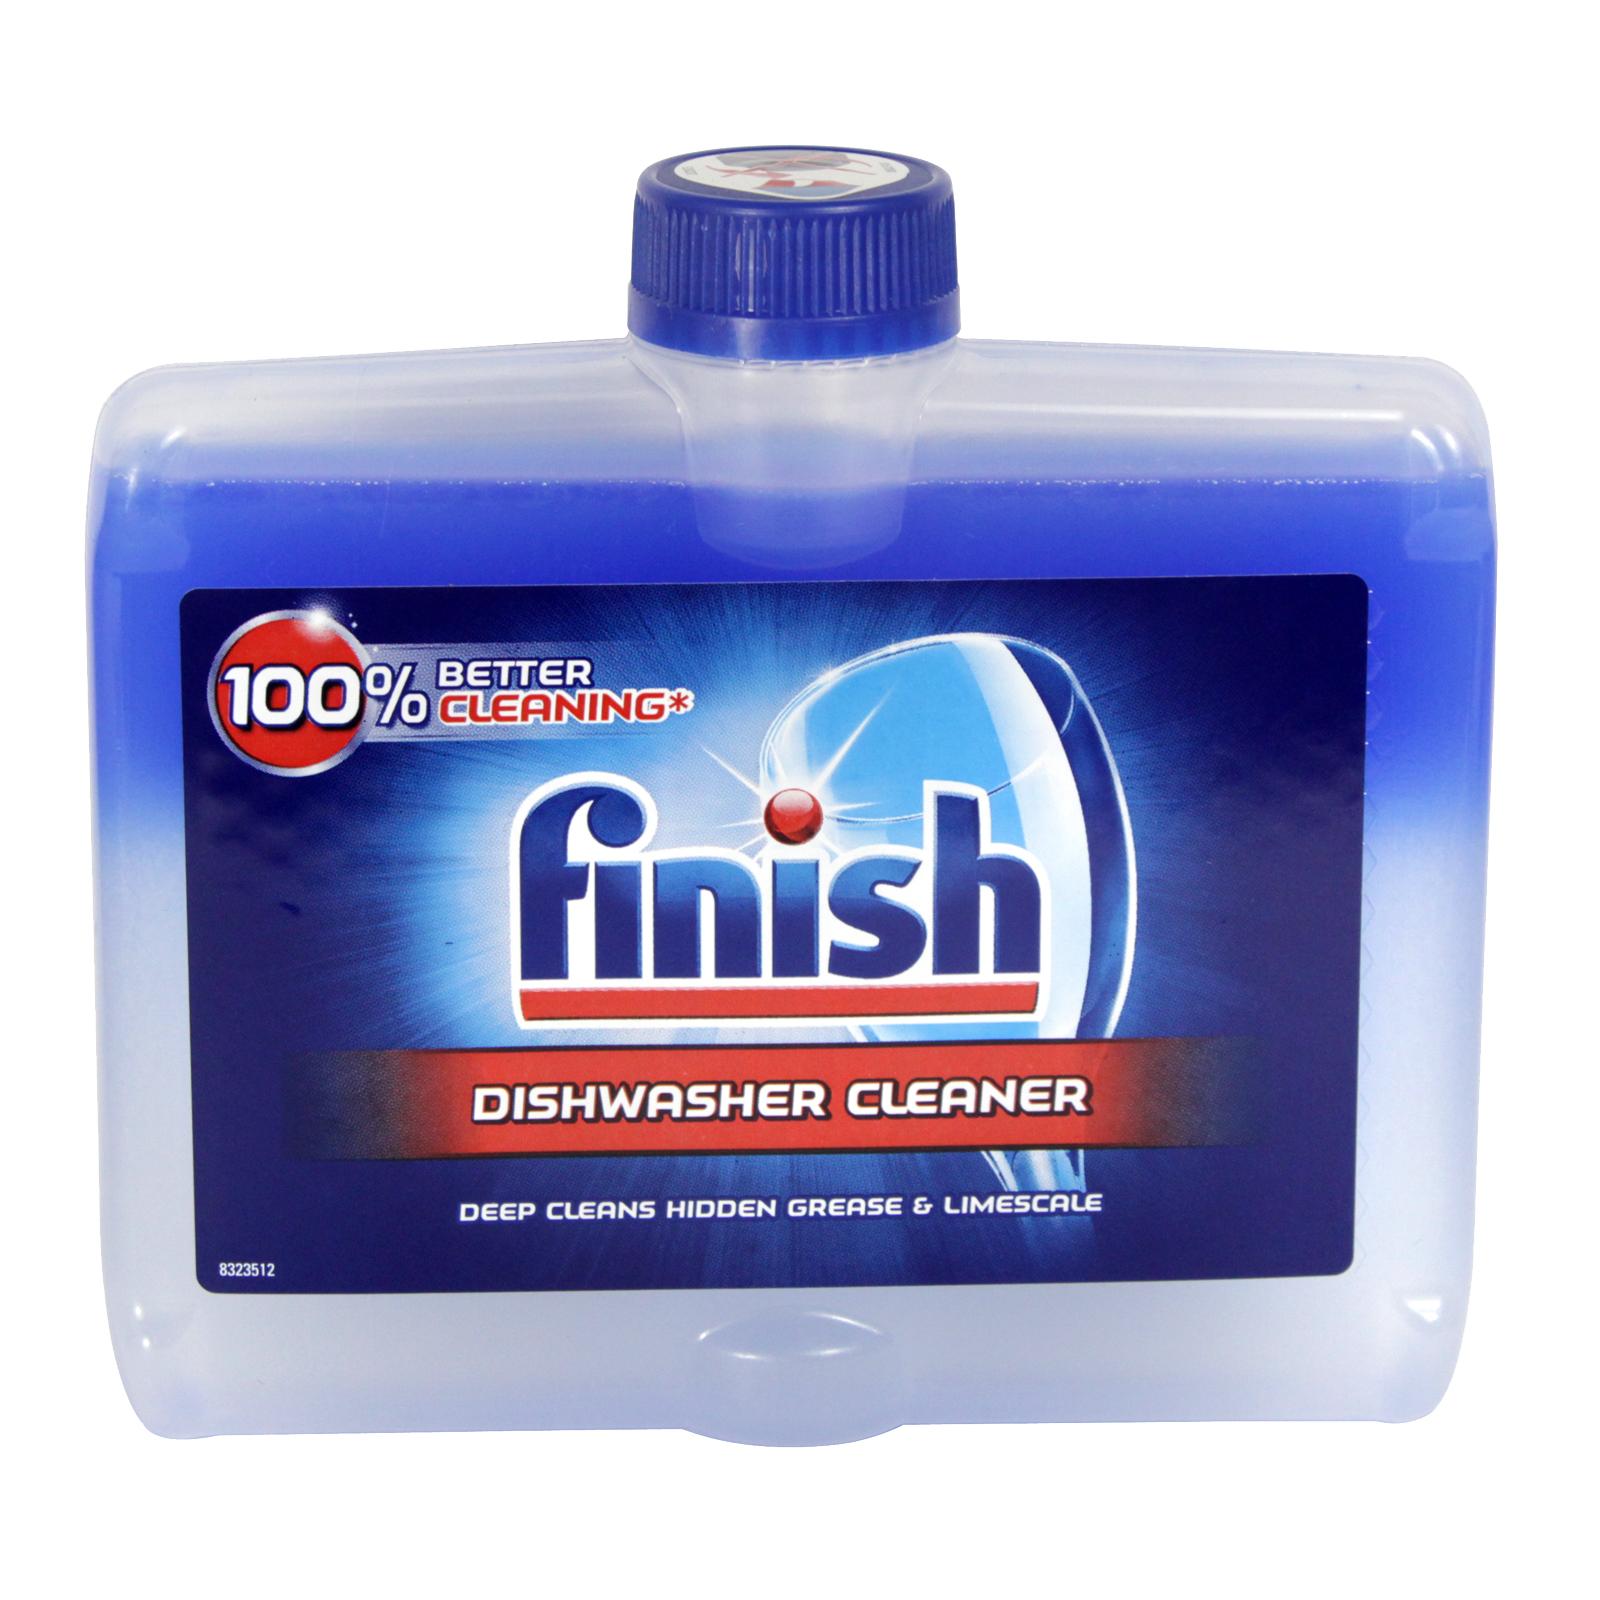 FINISH DISHWASHER CLEANER 250ML REGULAR